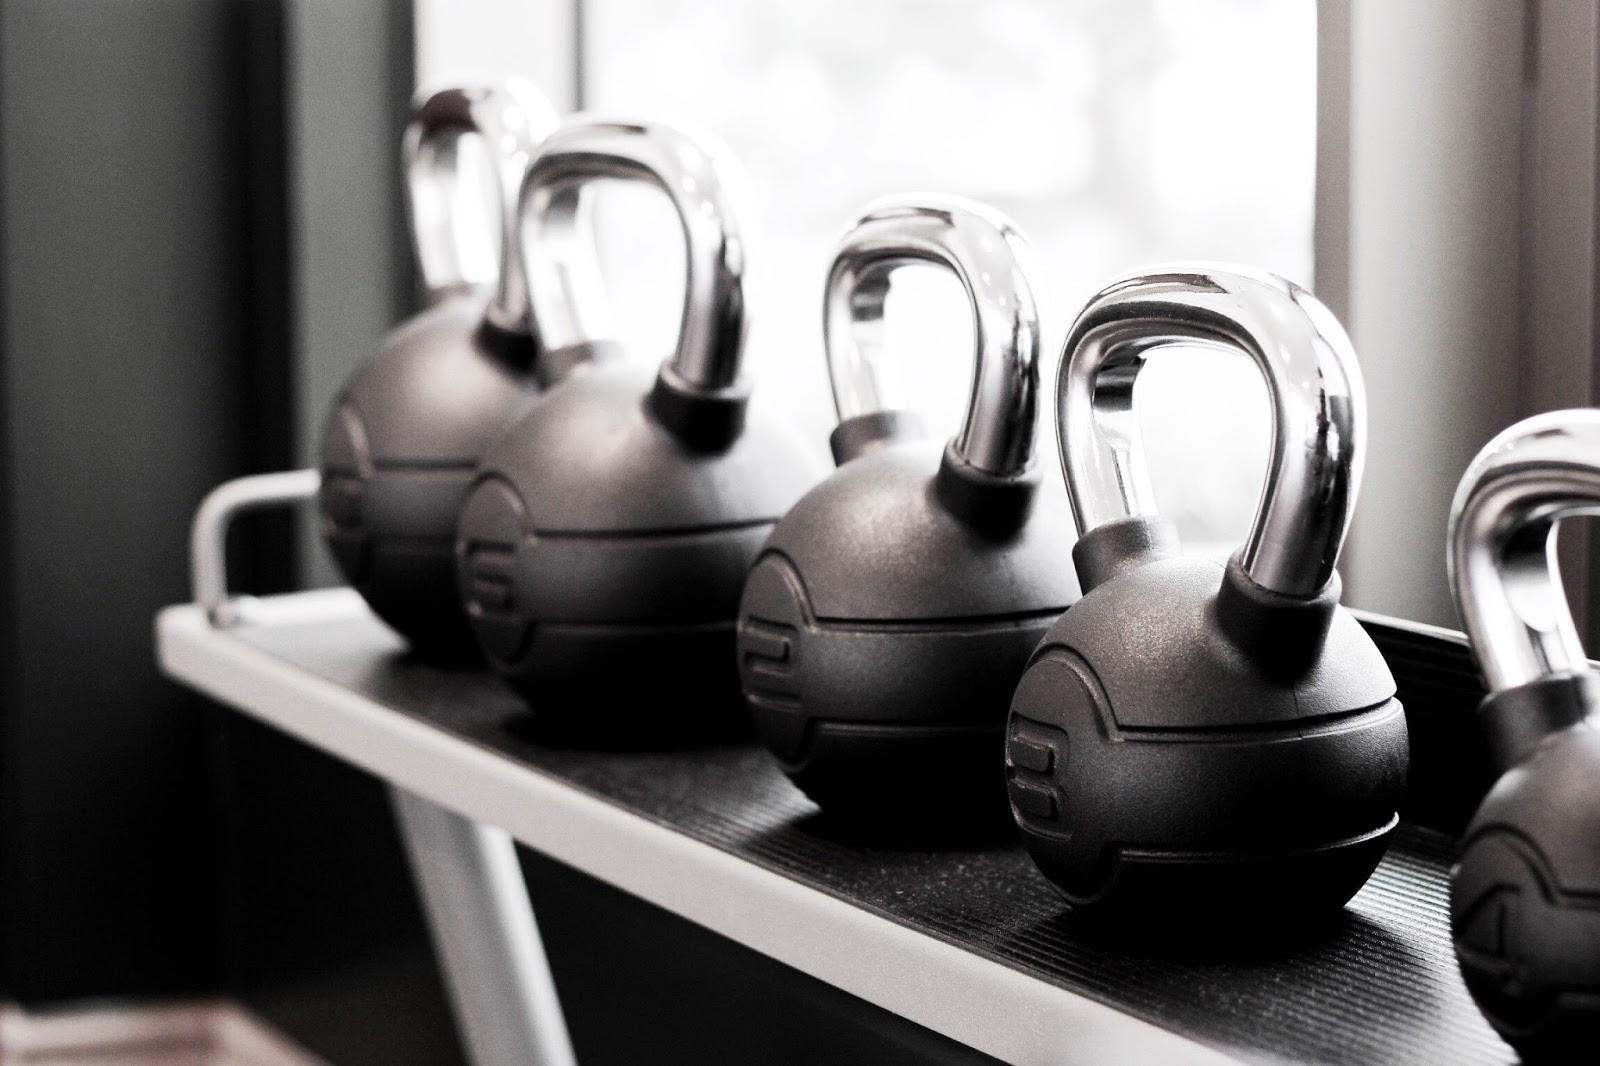 Line of kettlebells at hotel gym